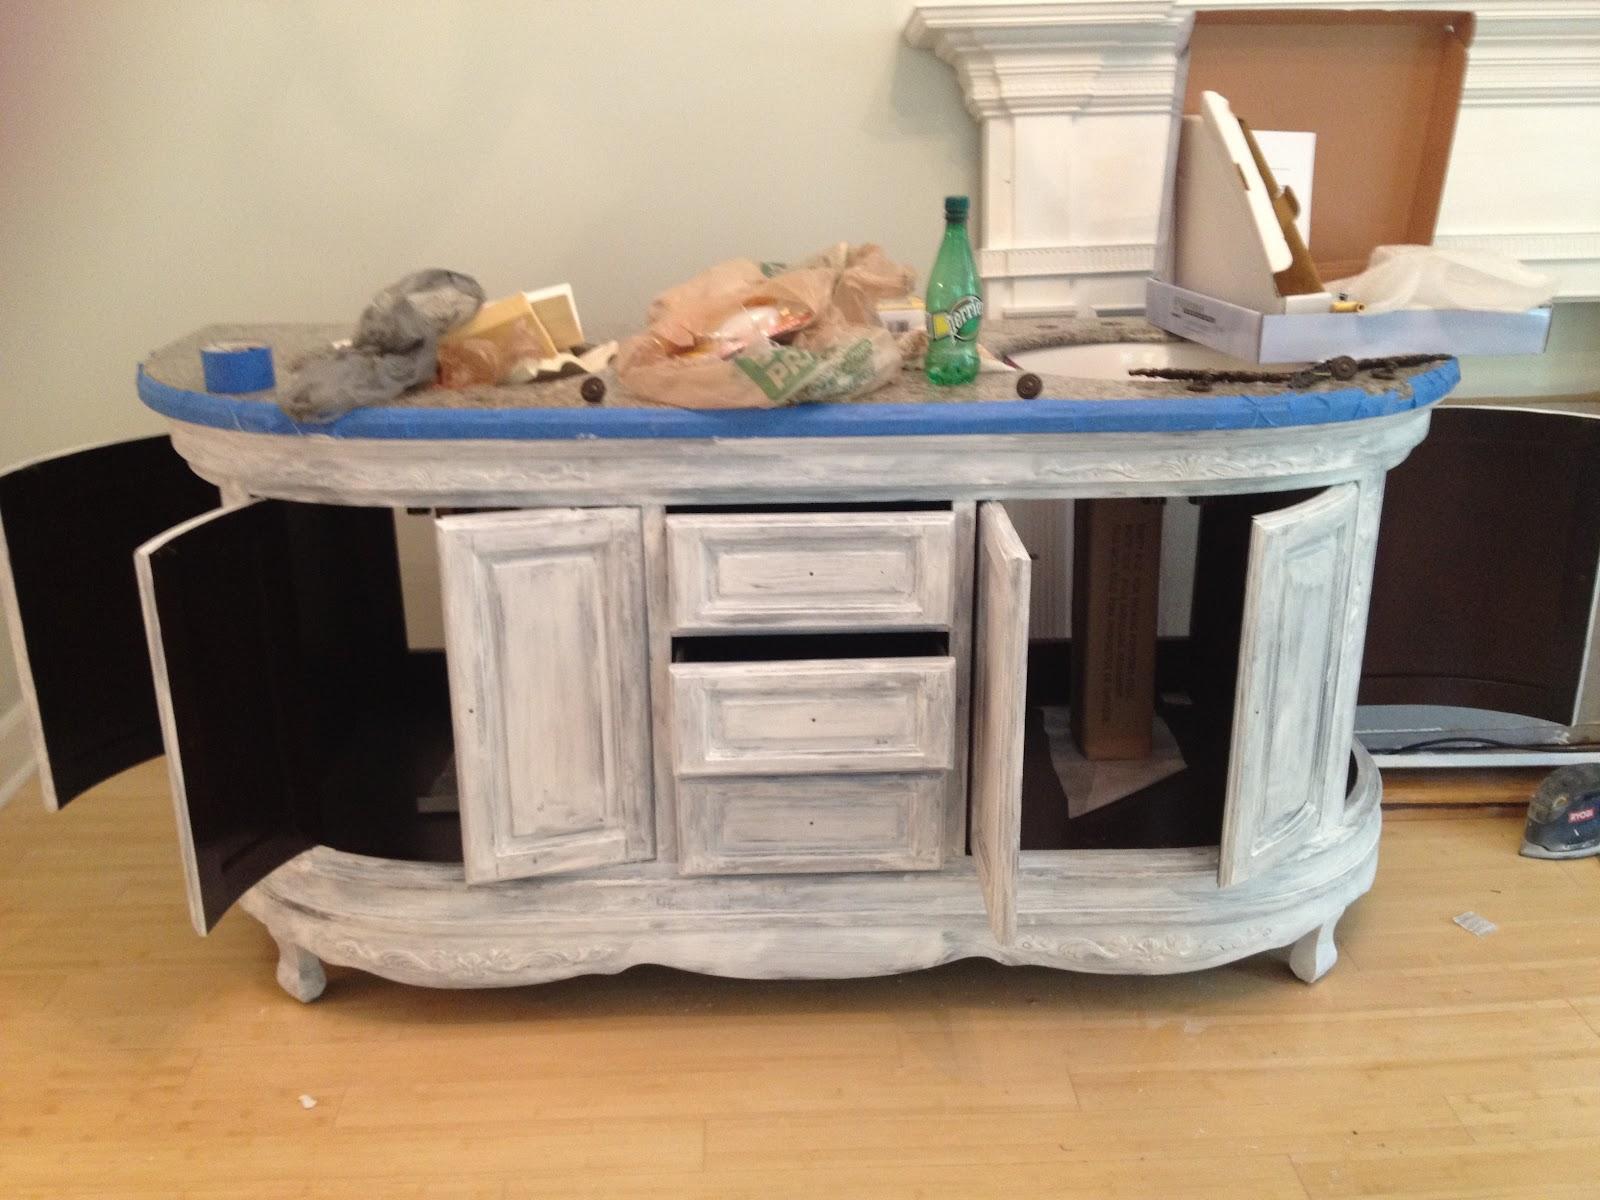 Mel & Liza: Bathroom Renovations: The Vanity